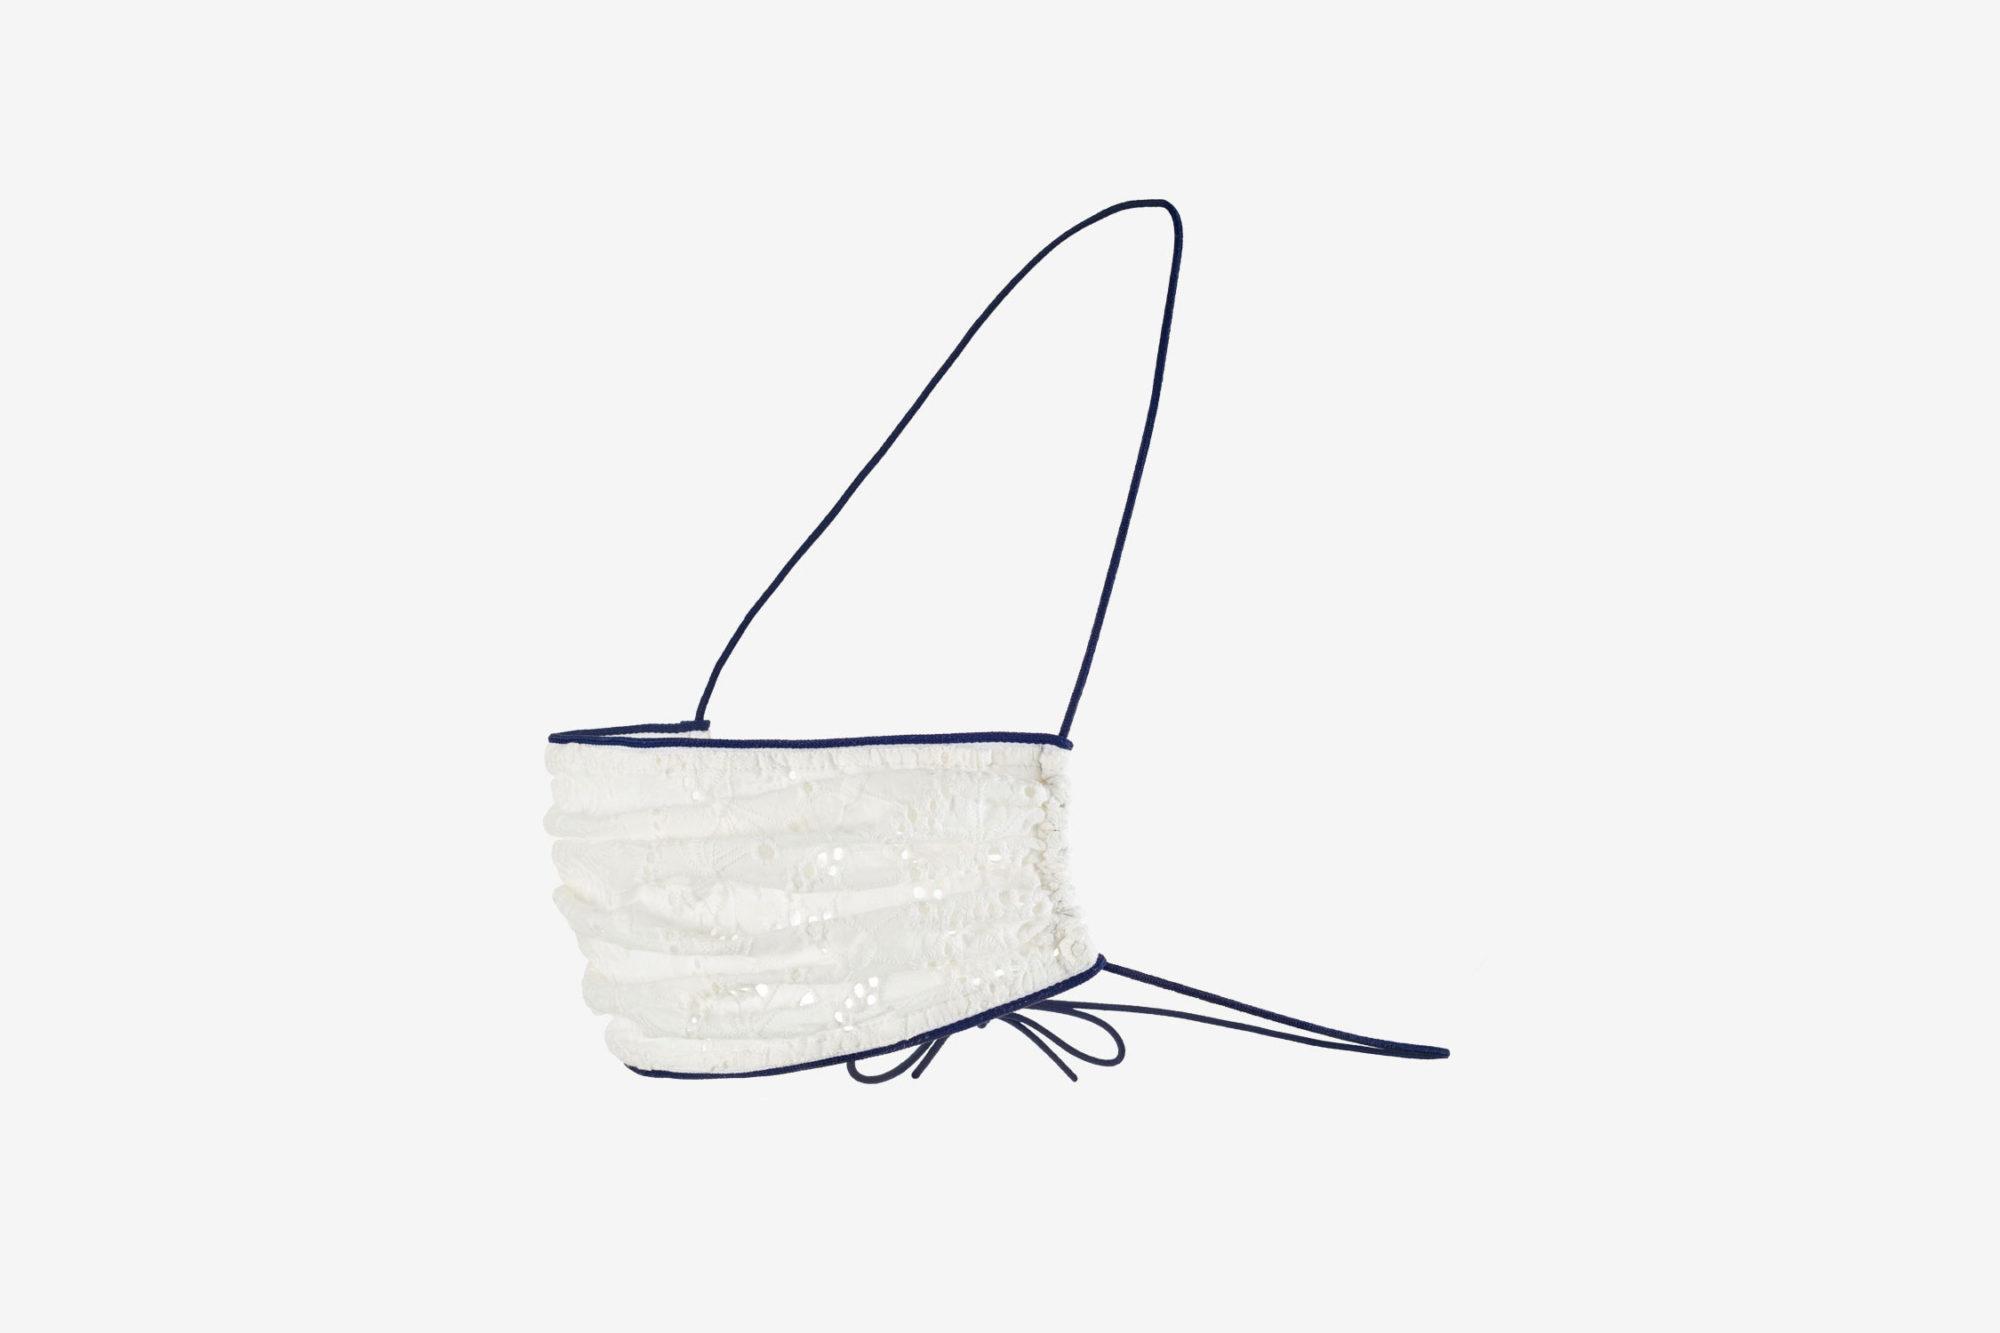 Sujetador Parche Monokini, de Anna Bonny, para un solo pecho